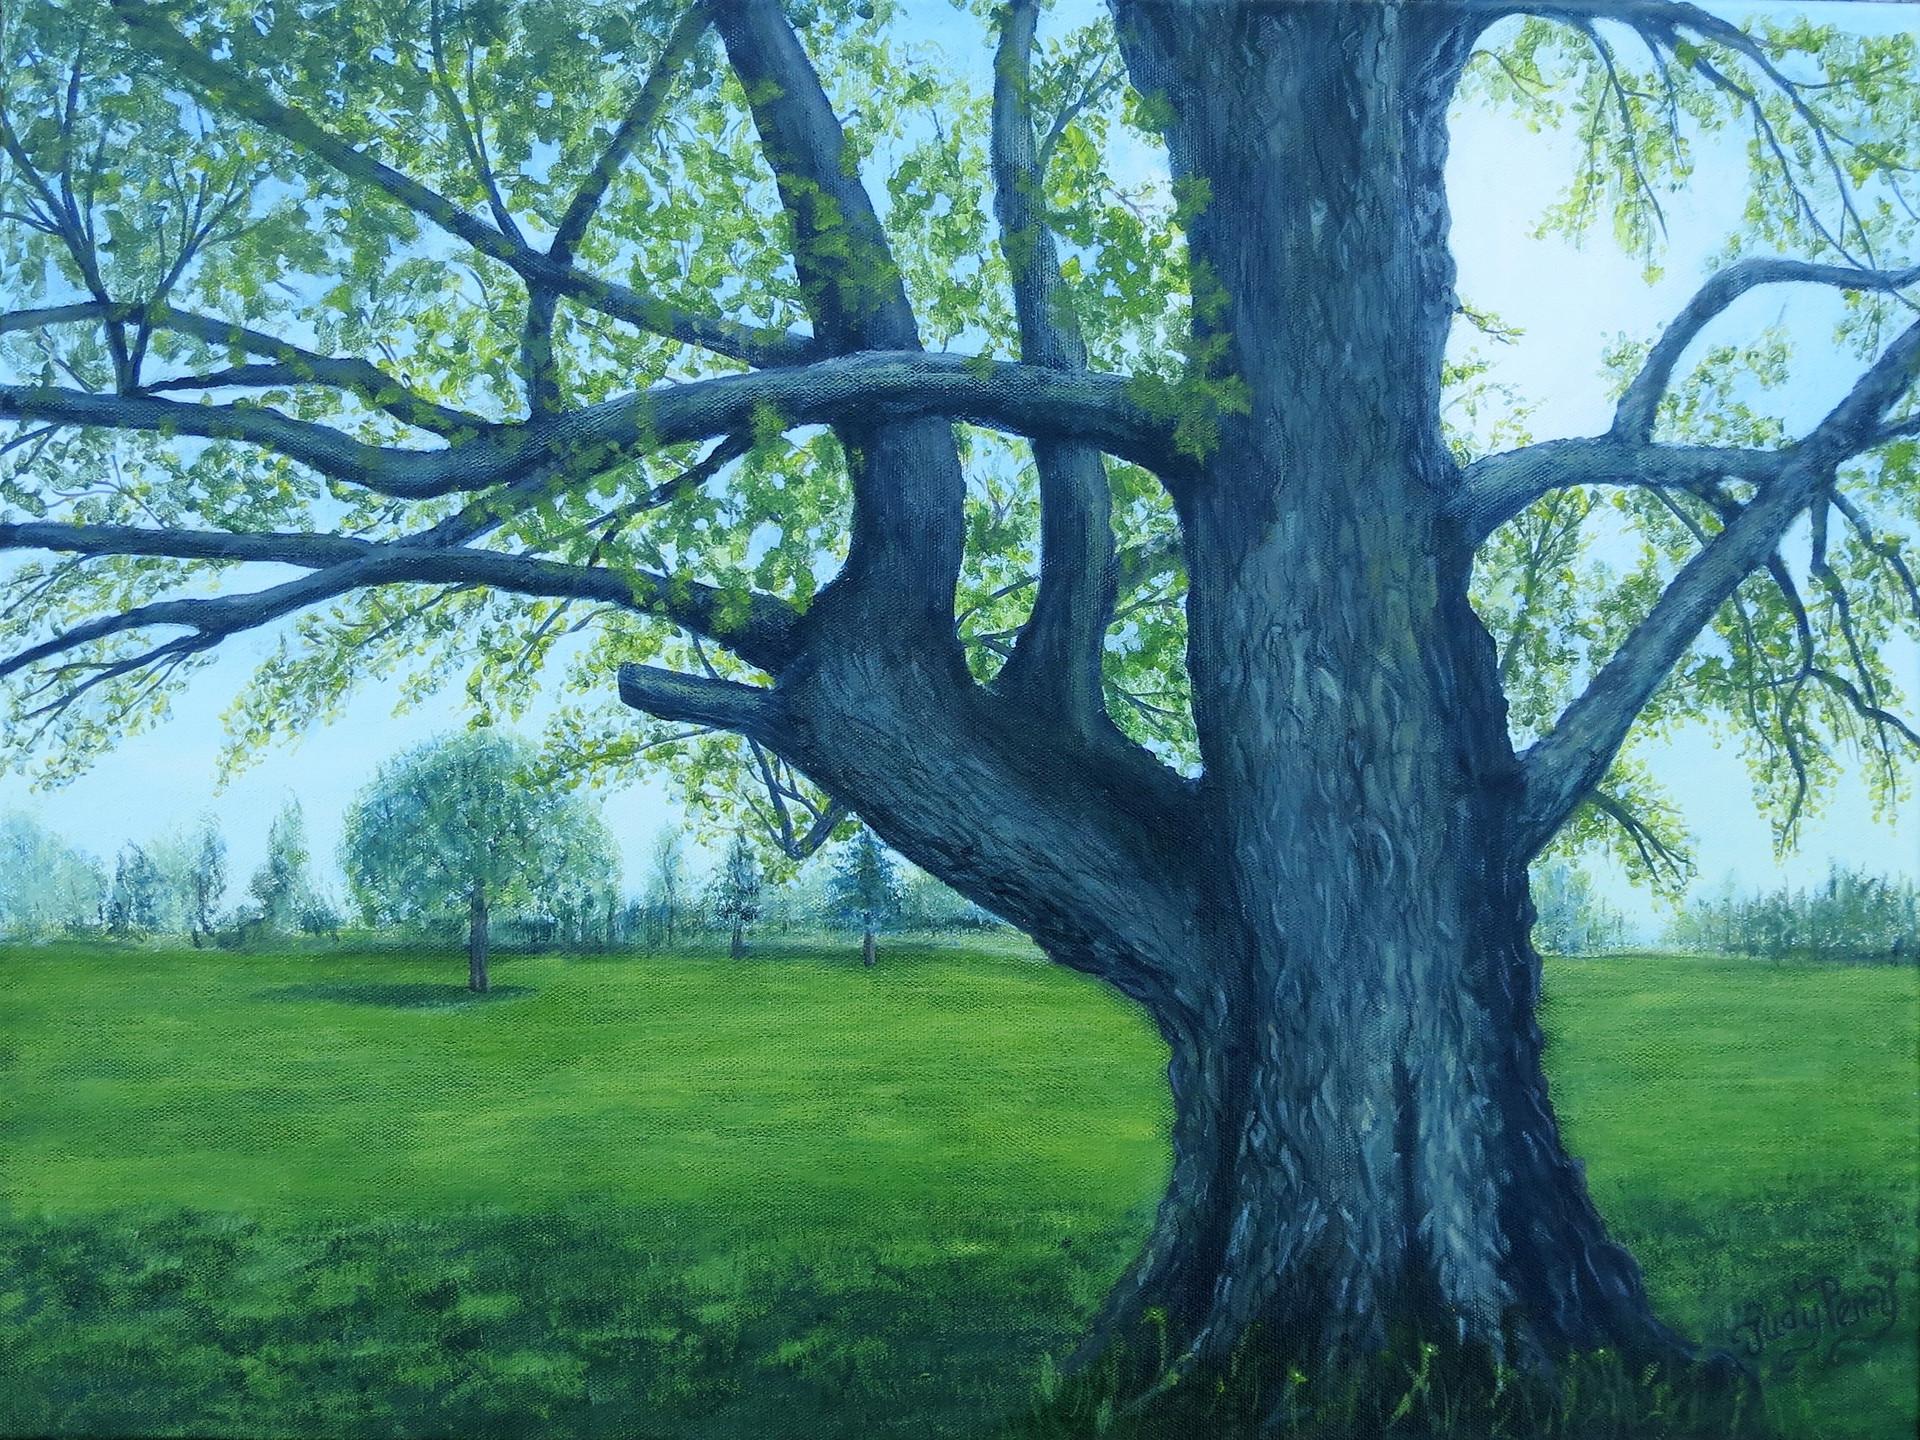 2013-09-01 International Memorial Tree 1